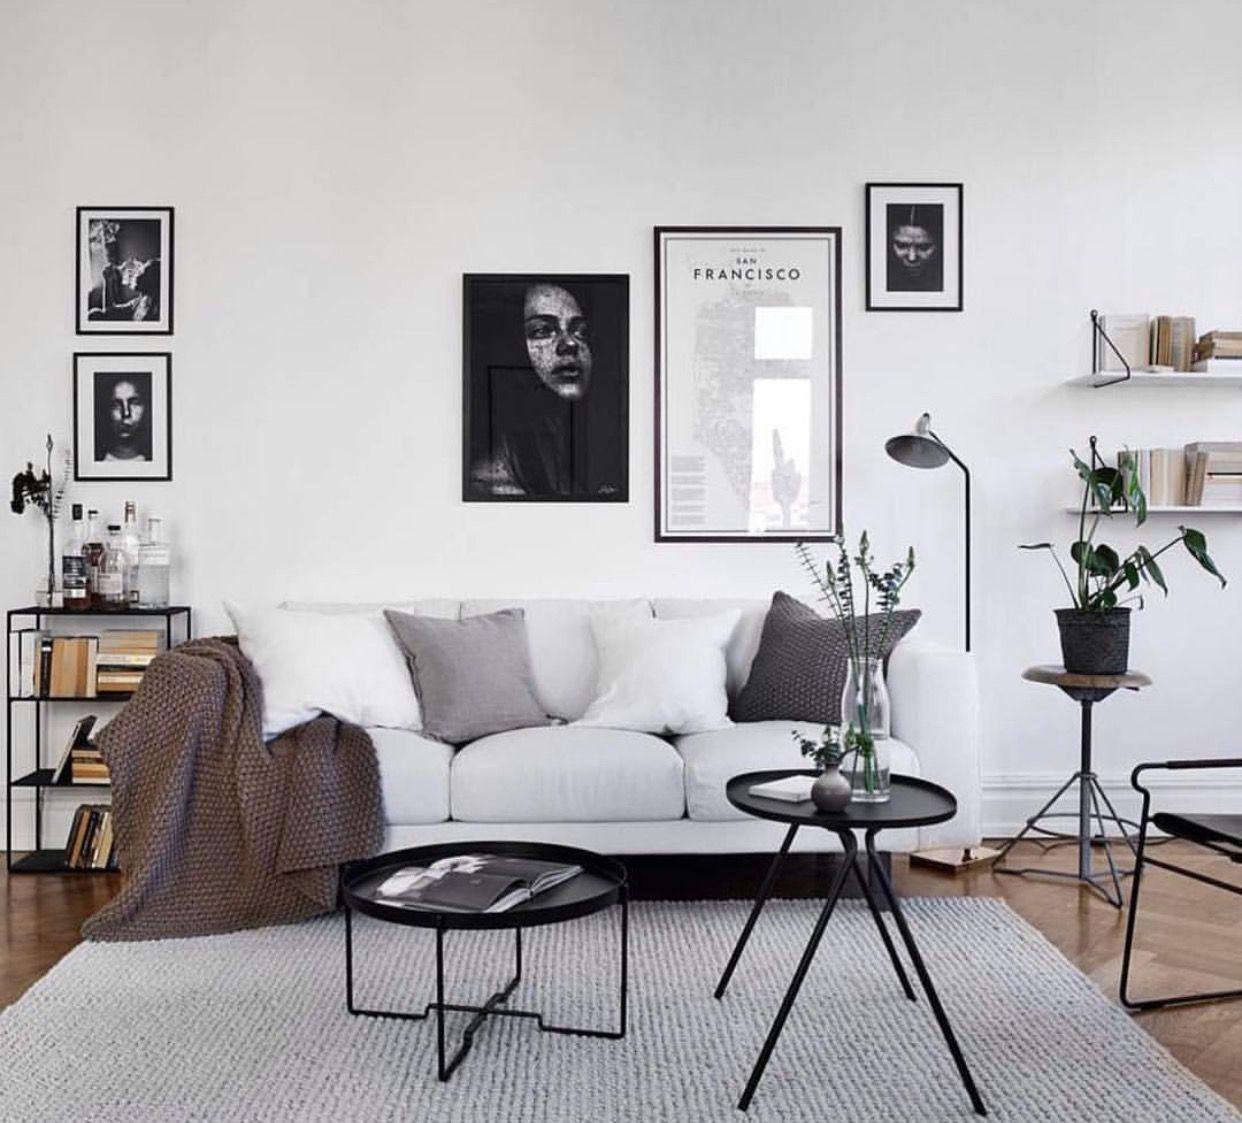 b3cbdc22d60296 Moderner Wohnstil Wohnung